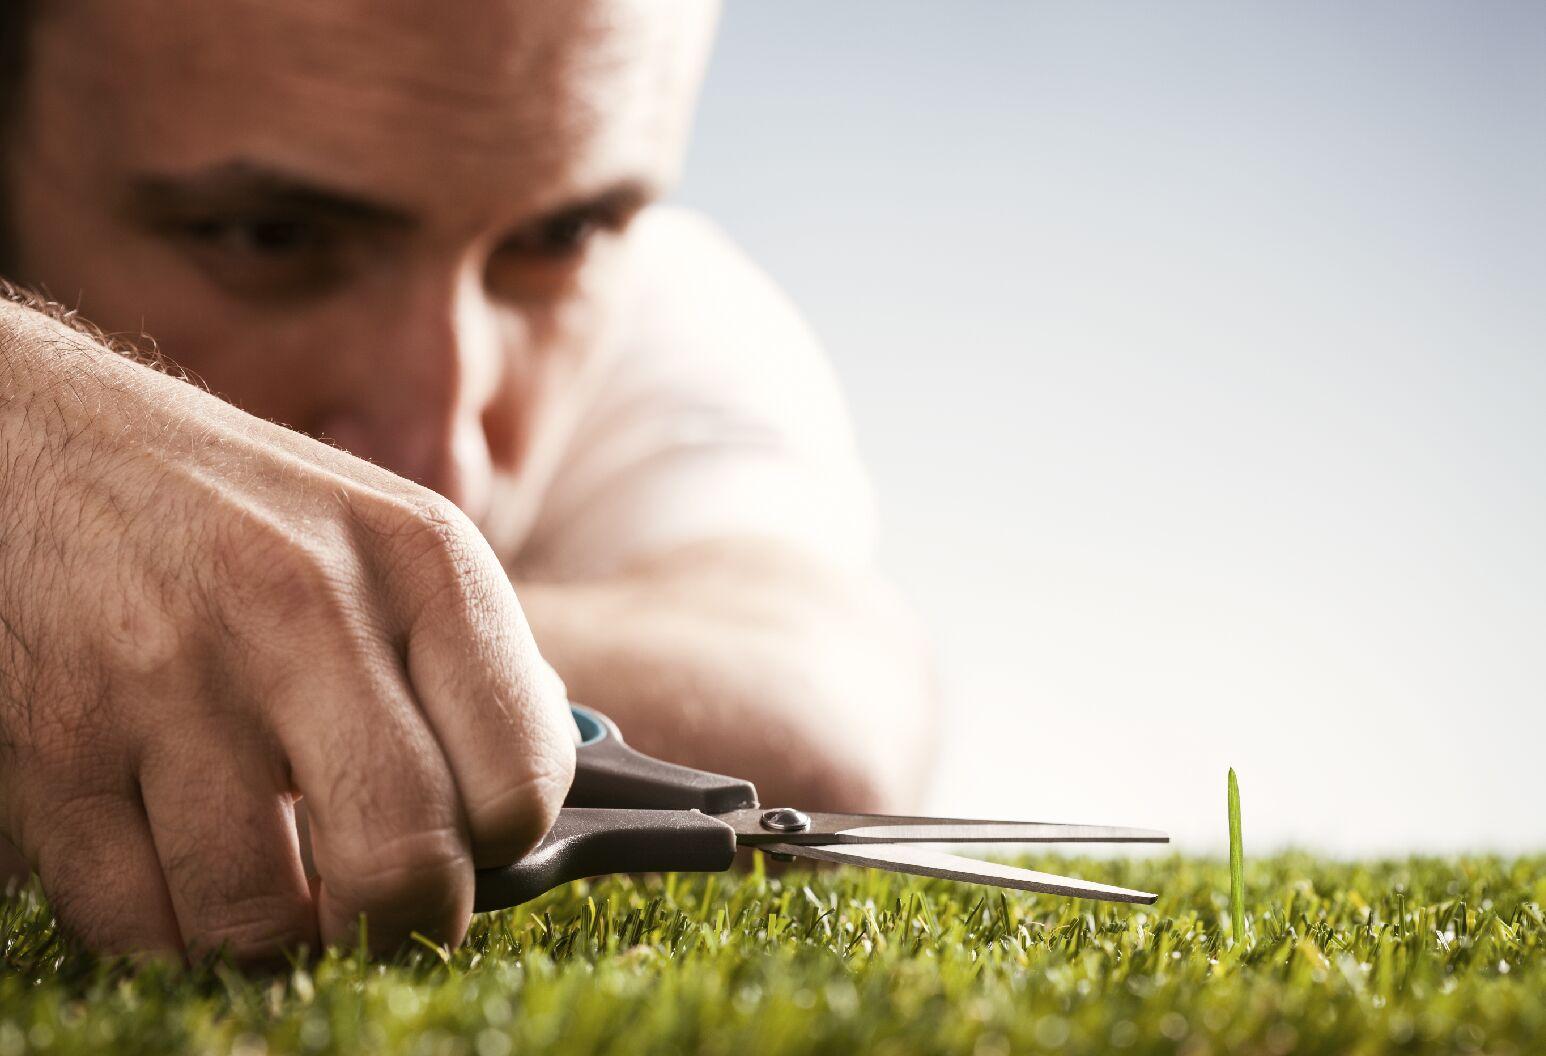 a man cutting a piece of grass with a scissors